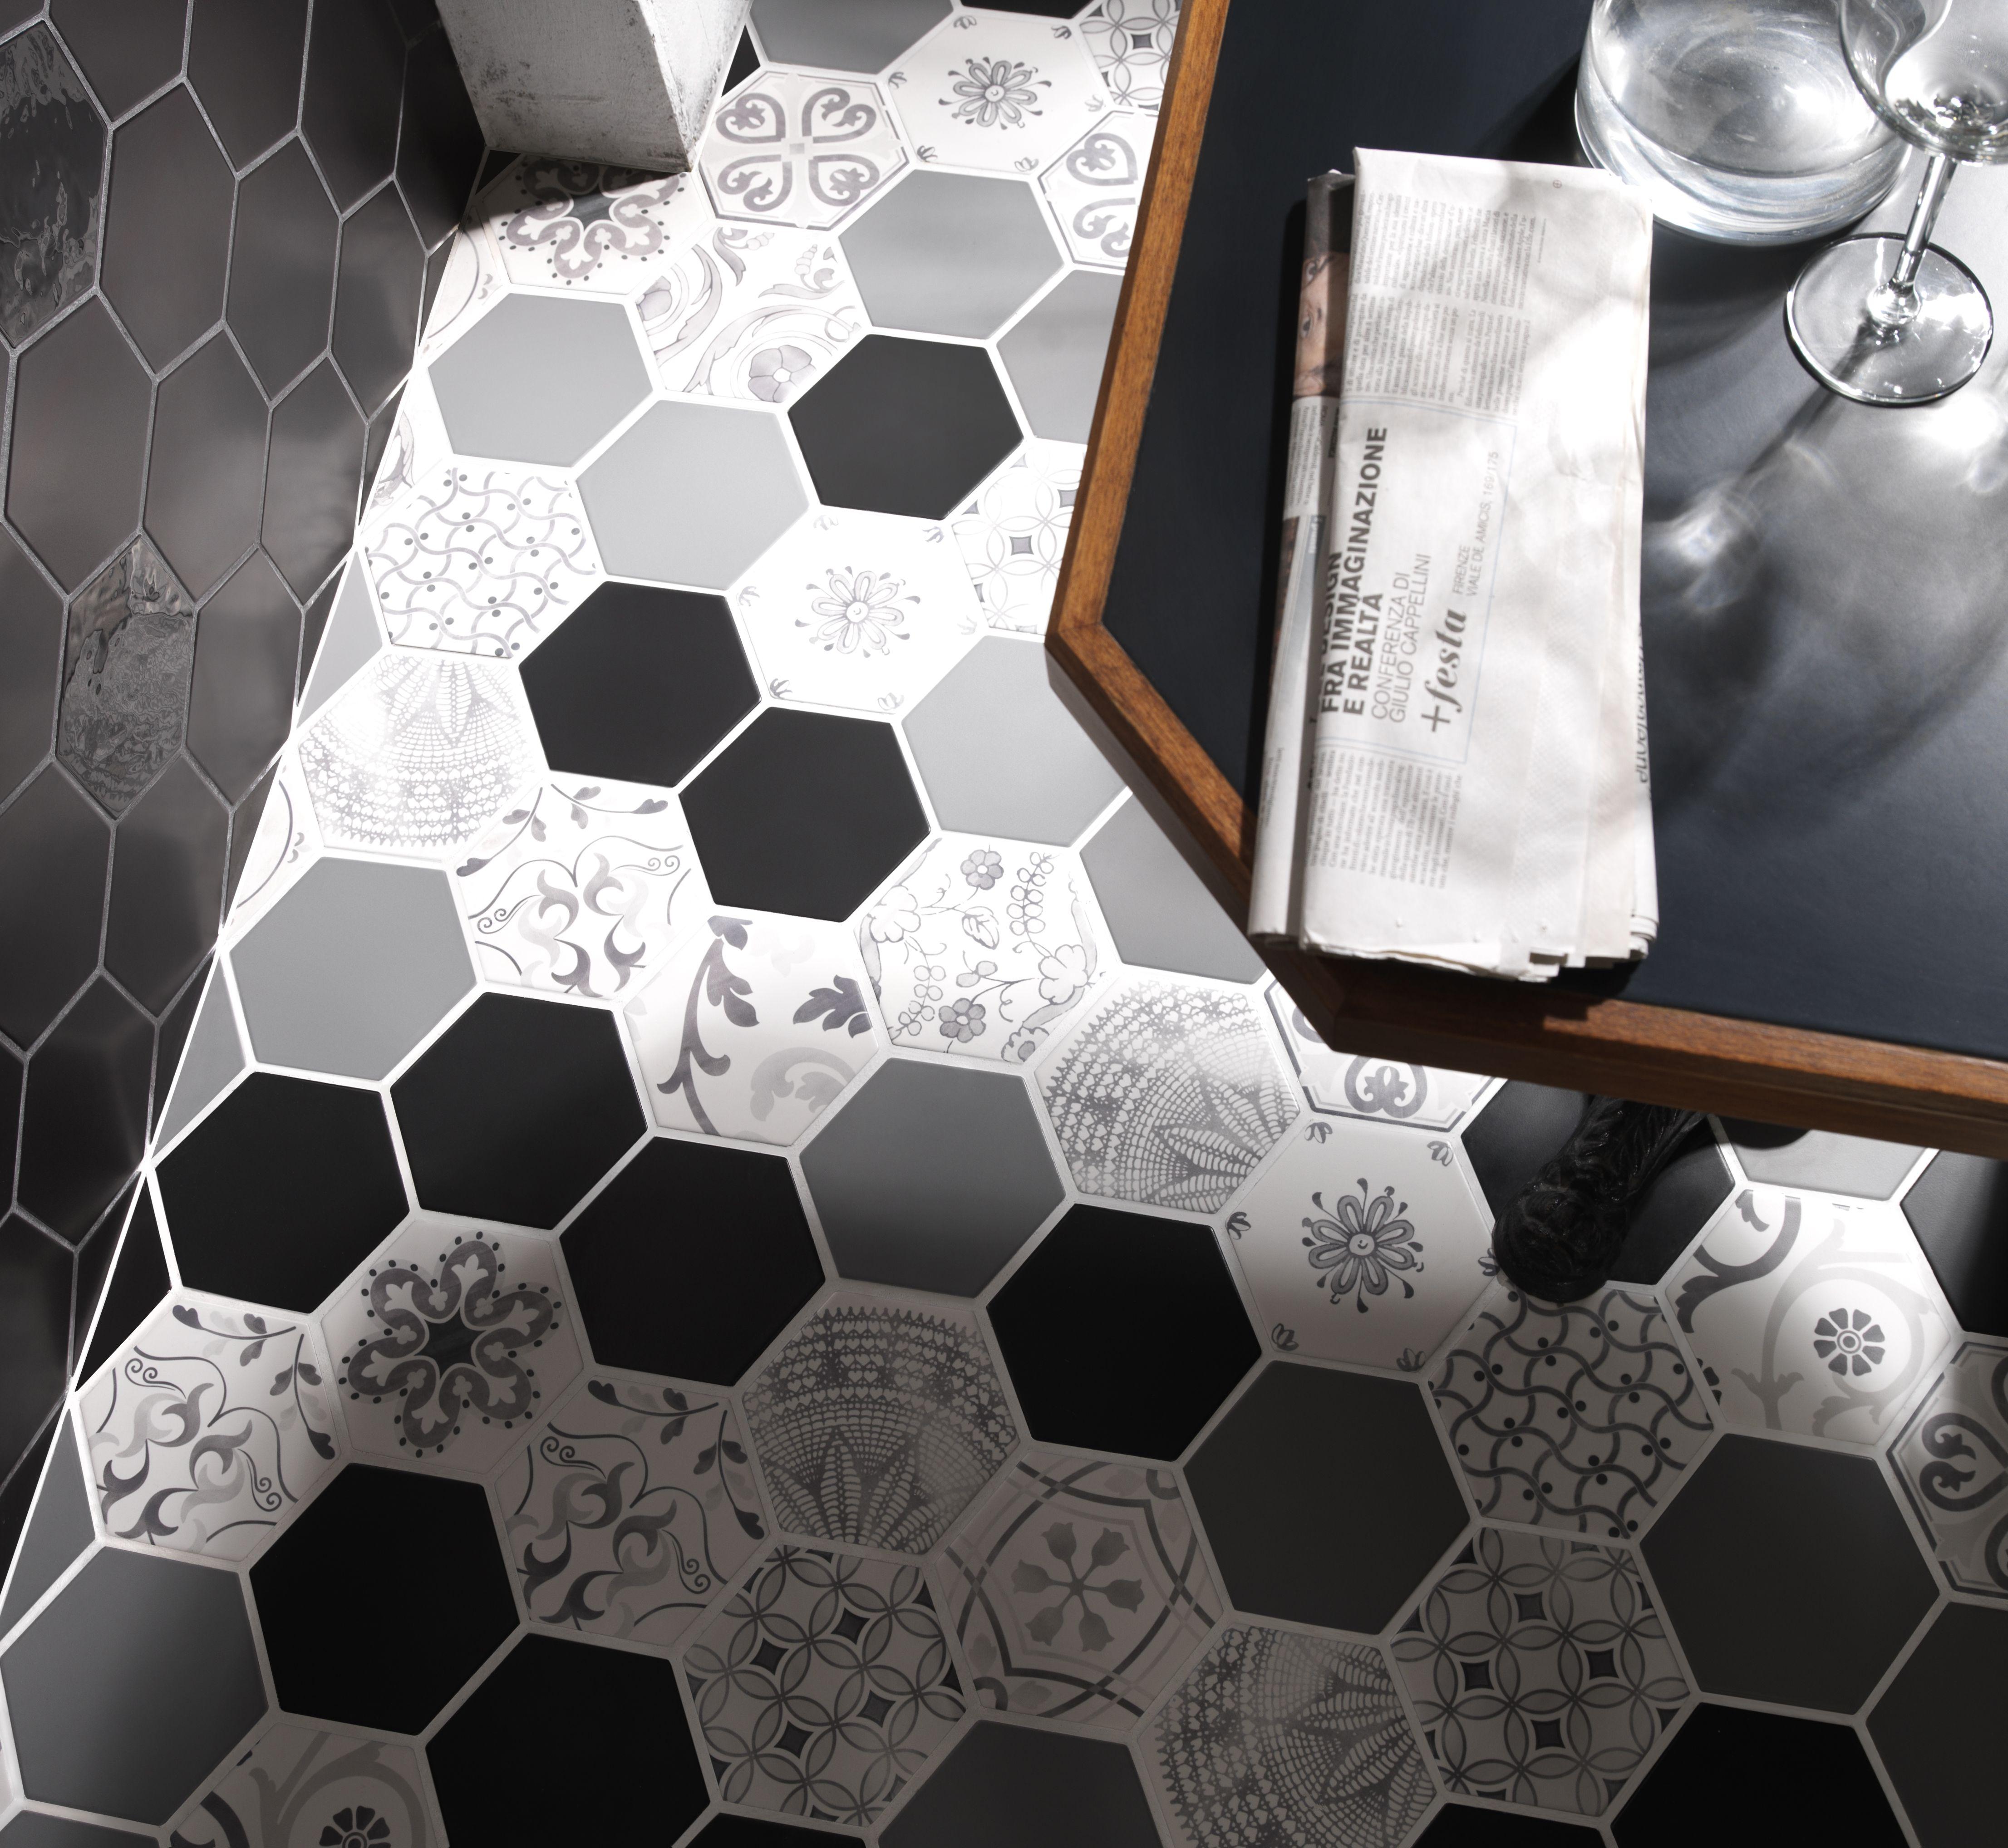 Examatt decoro examix tiles piastrelle walltiles for Pavimento ceramico hexagonal